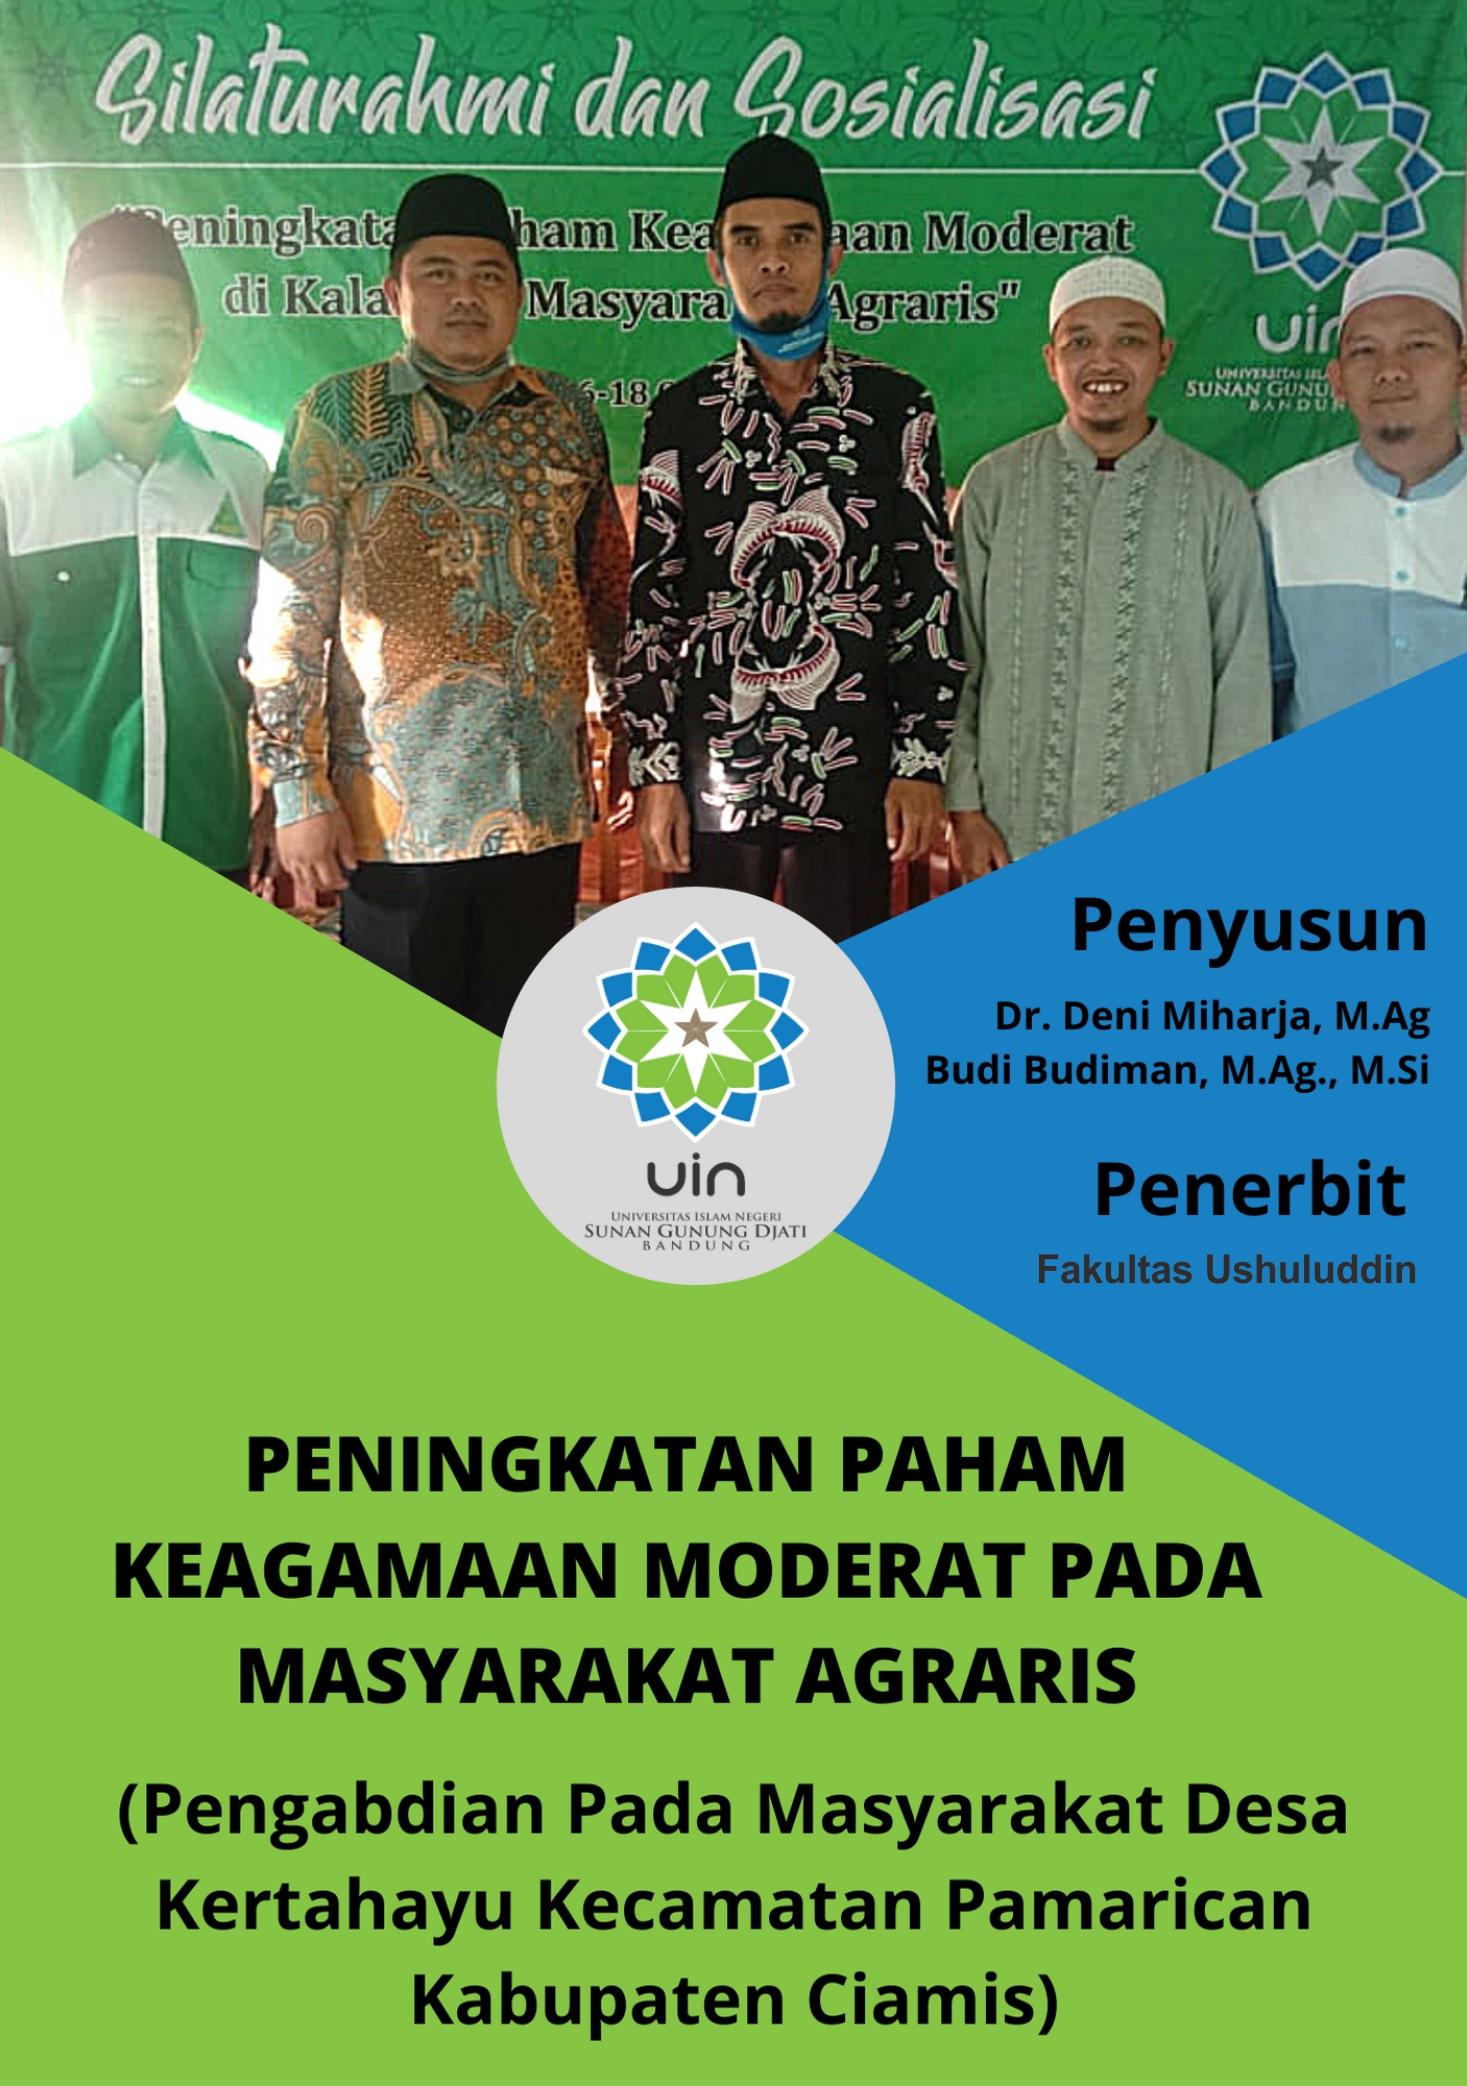 Peningkatan paham keagamaan moderat pada masyarakat agraris [sumber elektronis]  : pengabdian pada masyarakat Desa Kertahayu Kecamatan Pamarican Kabupaten Ciamis